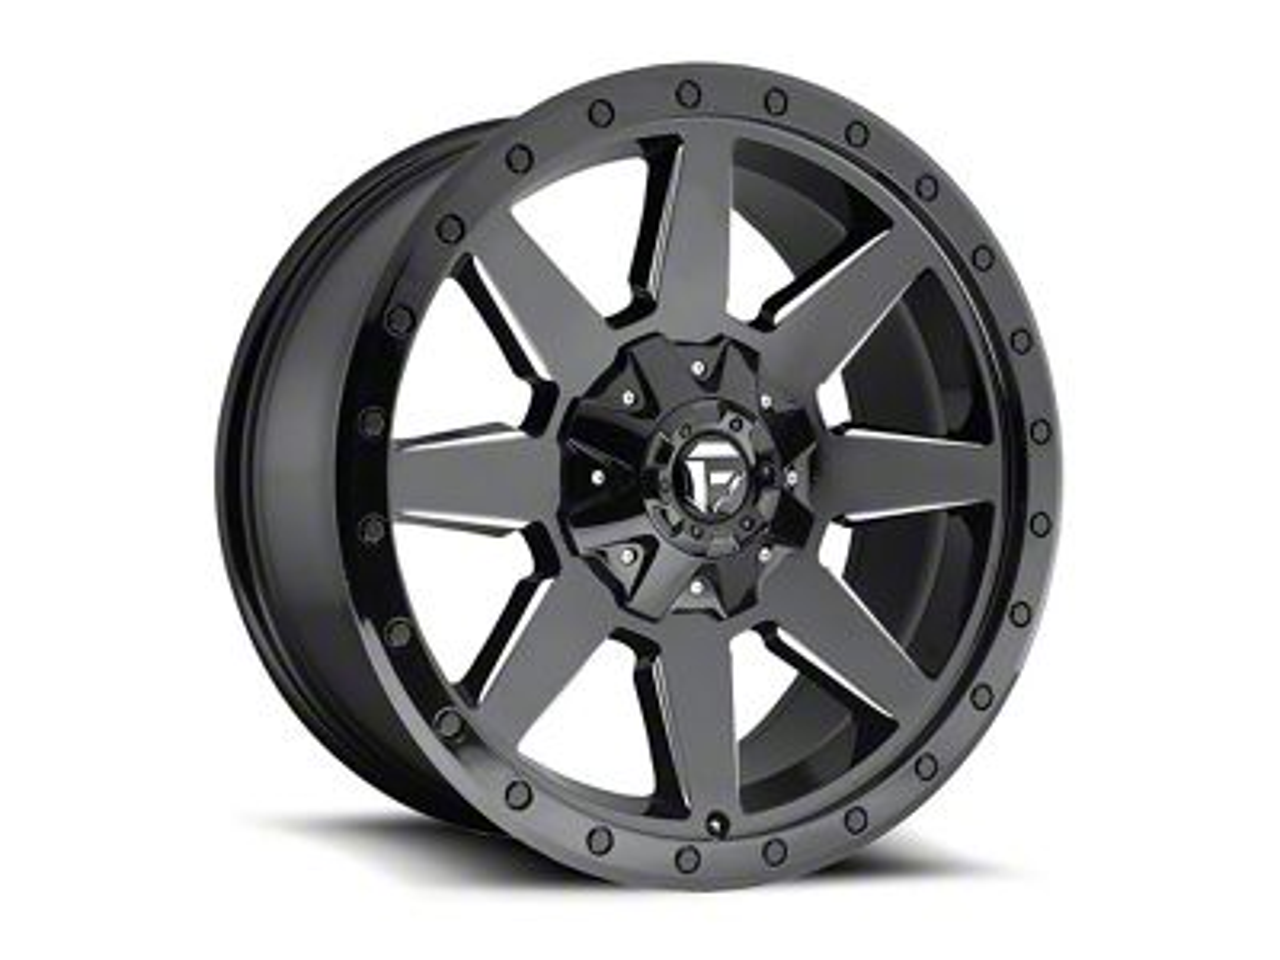 Fuel Wheels Wildcat Gloss Black Milled Wheel - 20x9 (87-06 Jeep Wrangler YJ & TJ)